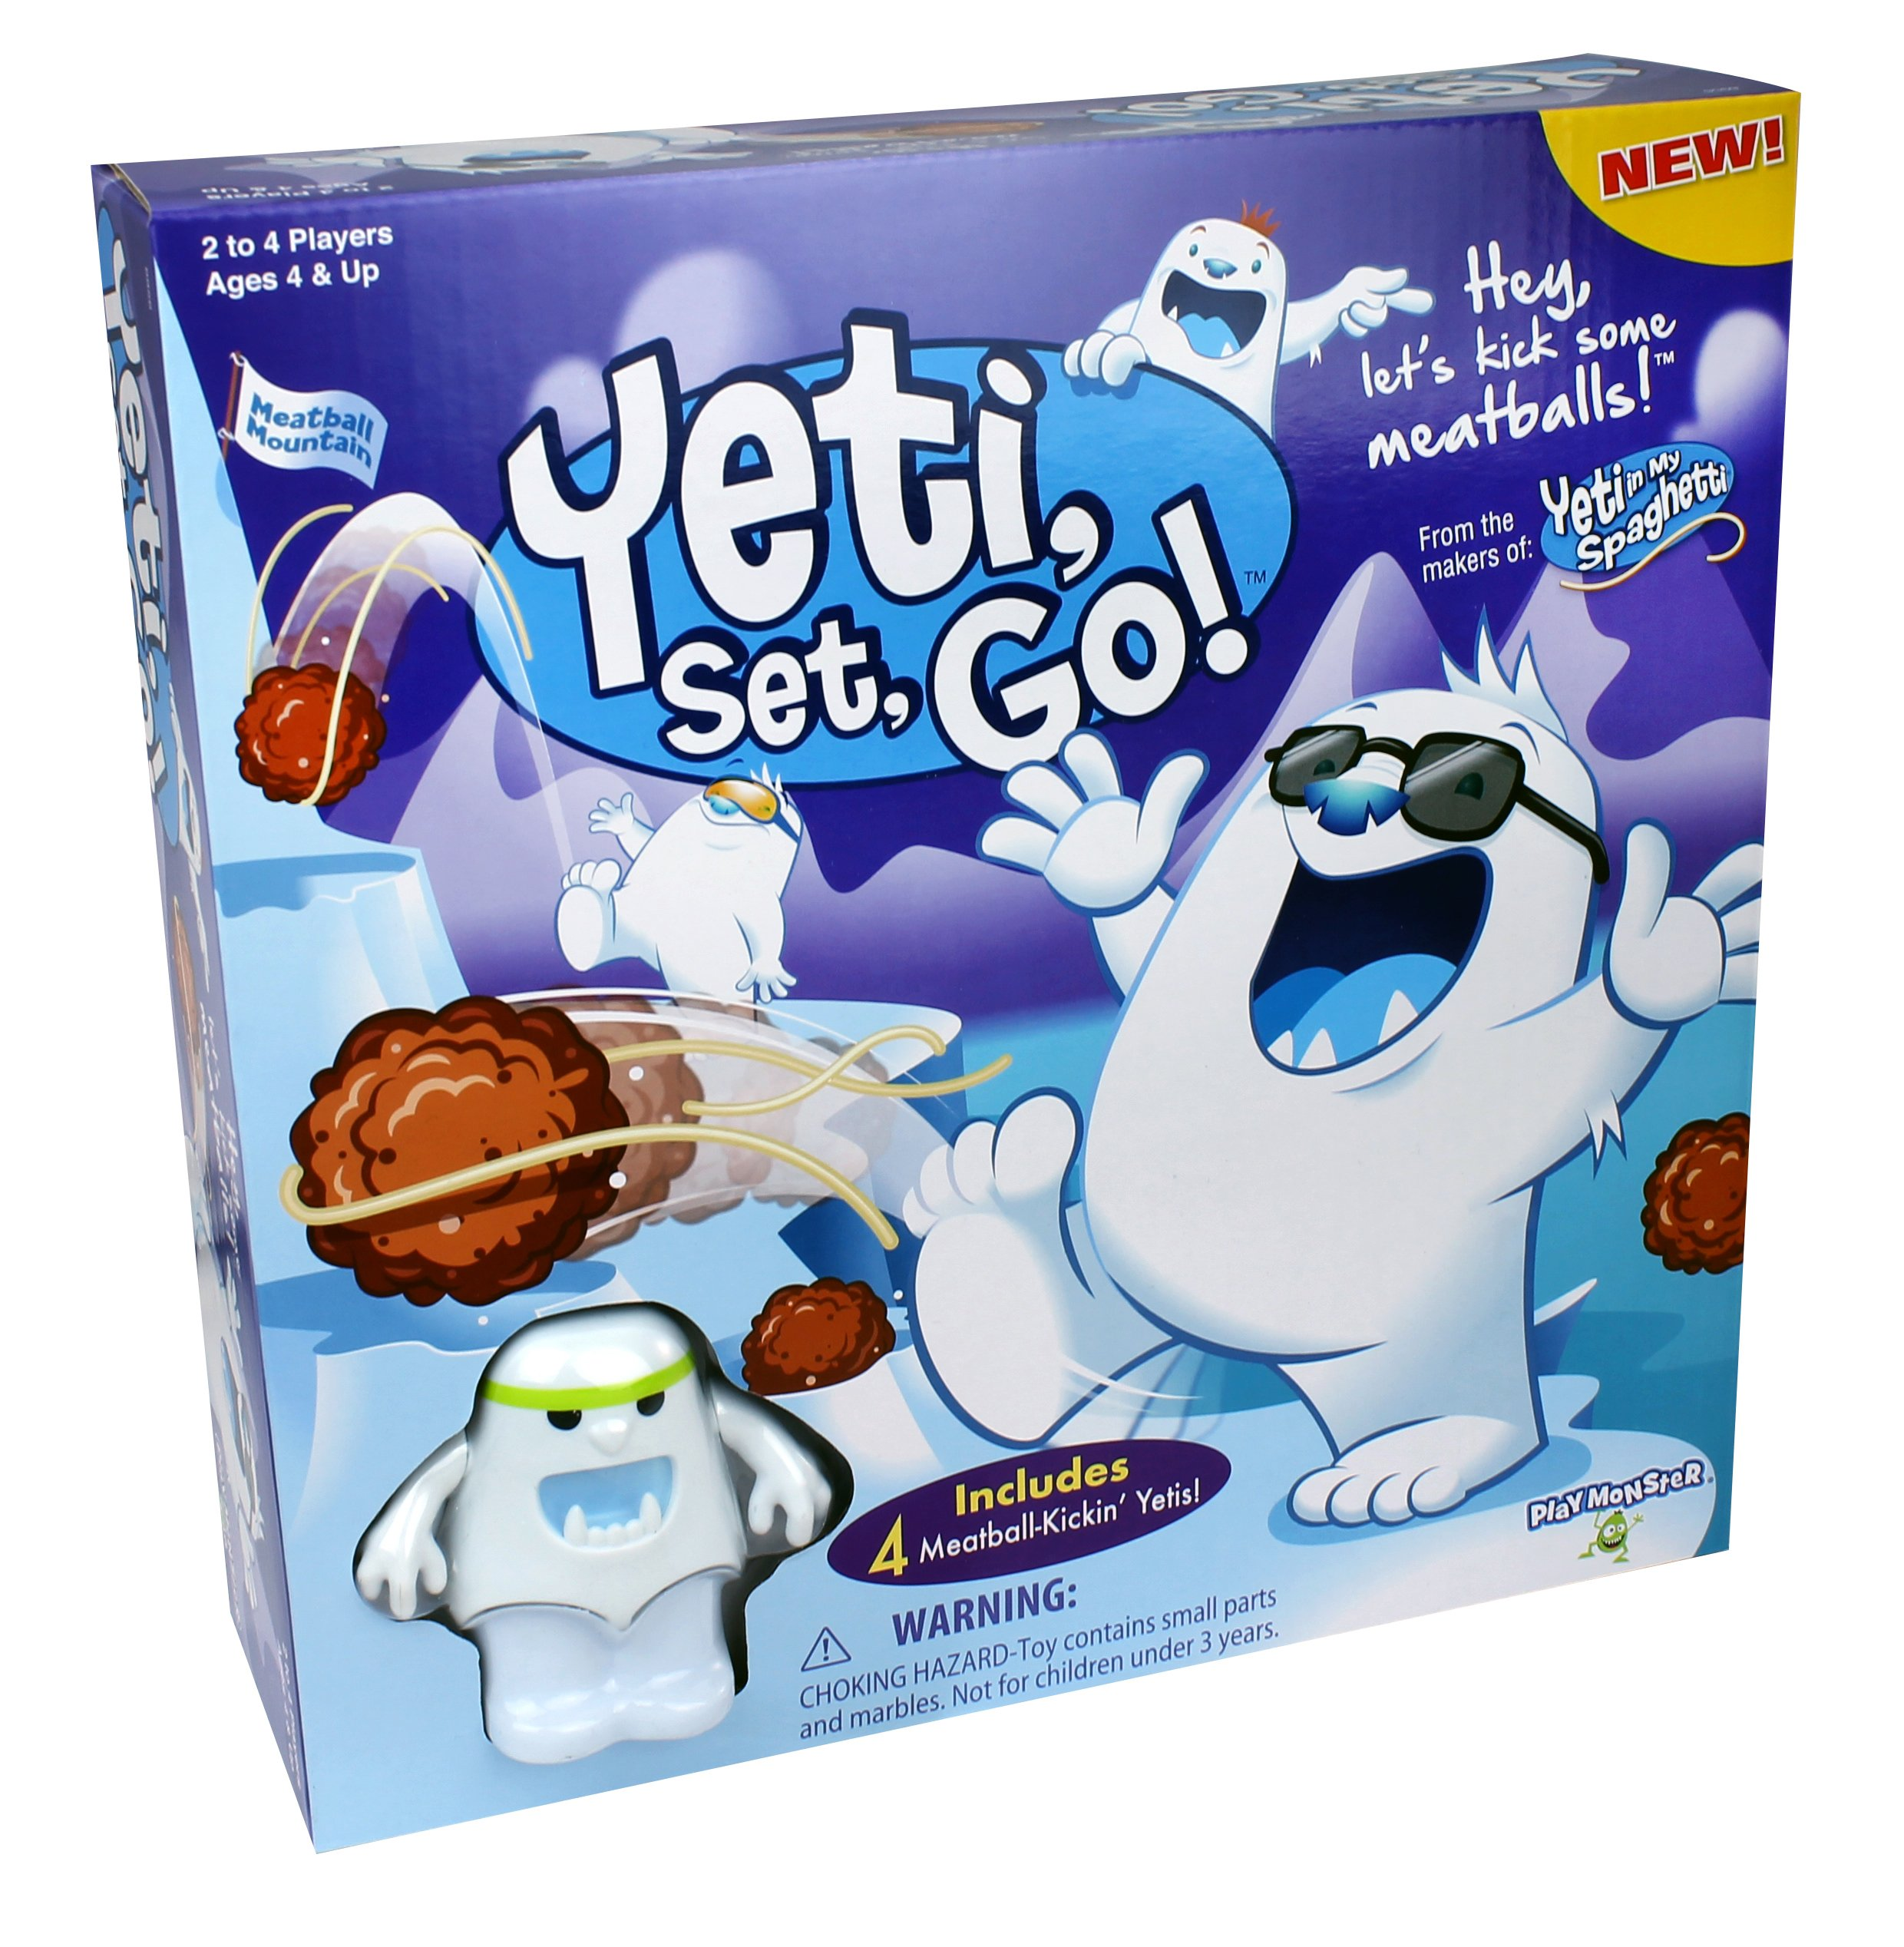 Yeti, Set, Go! Game - Hey, Let's Kick Some Meatballs!